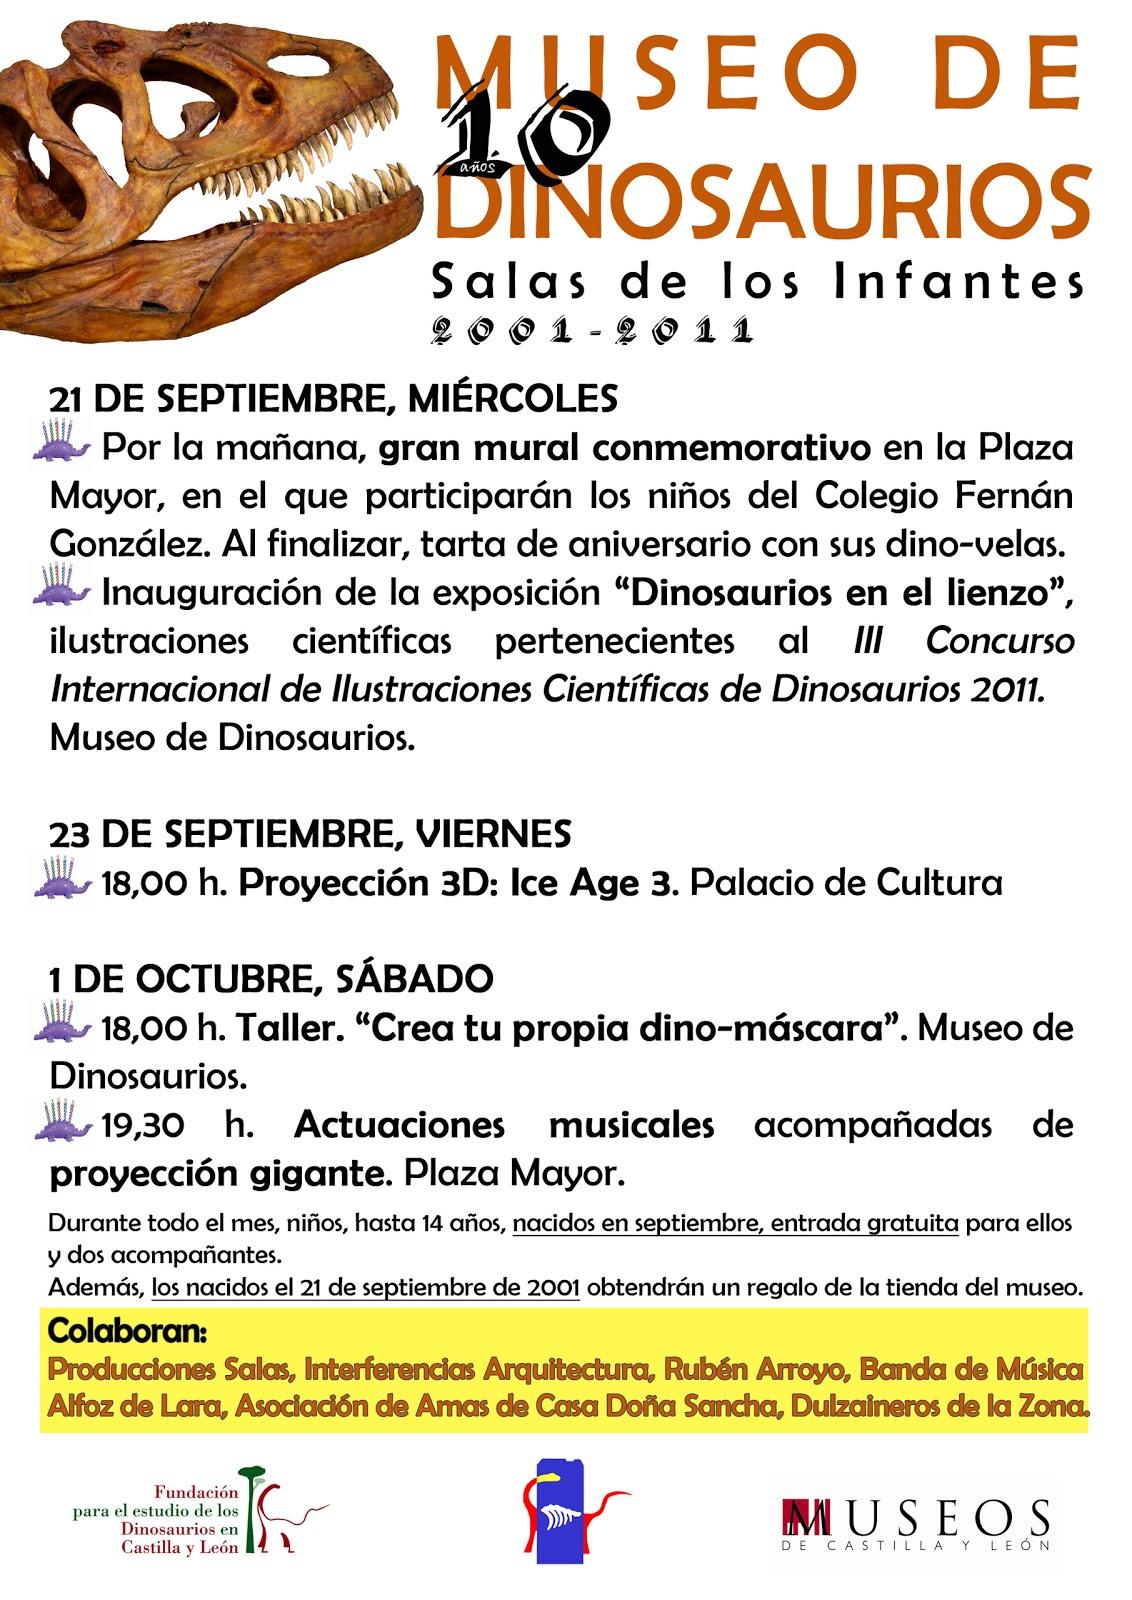 Fundacion dinosaurios cyl septiembre 2011 for Articulo de cultura para periodico mural